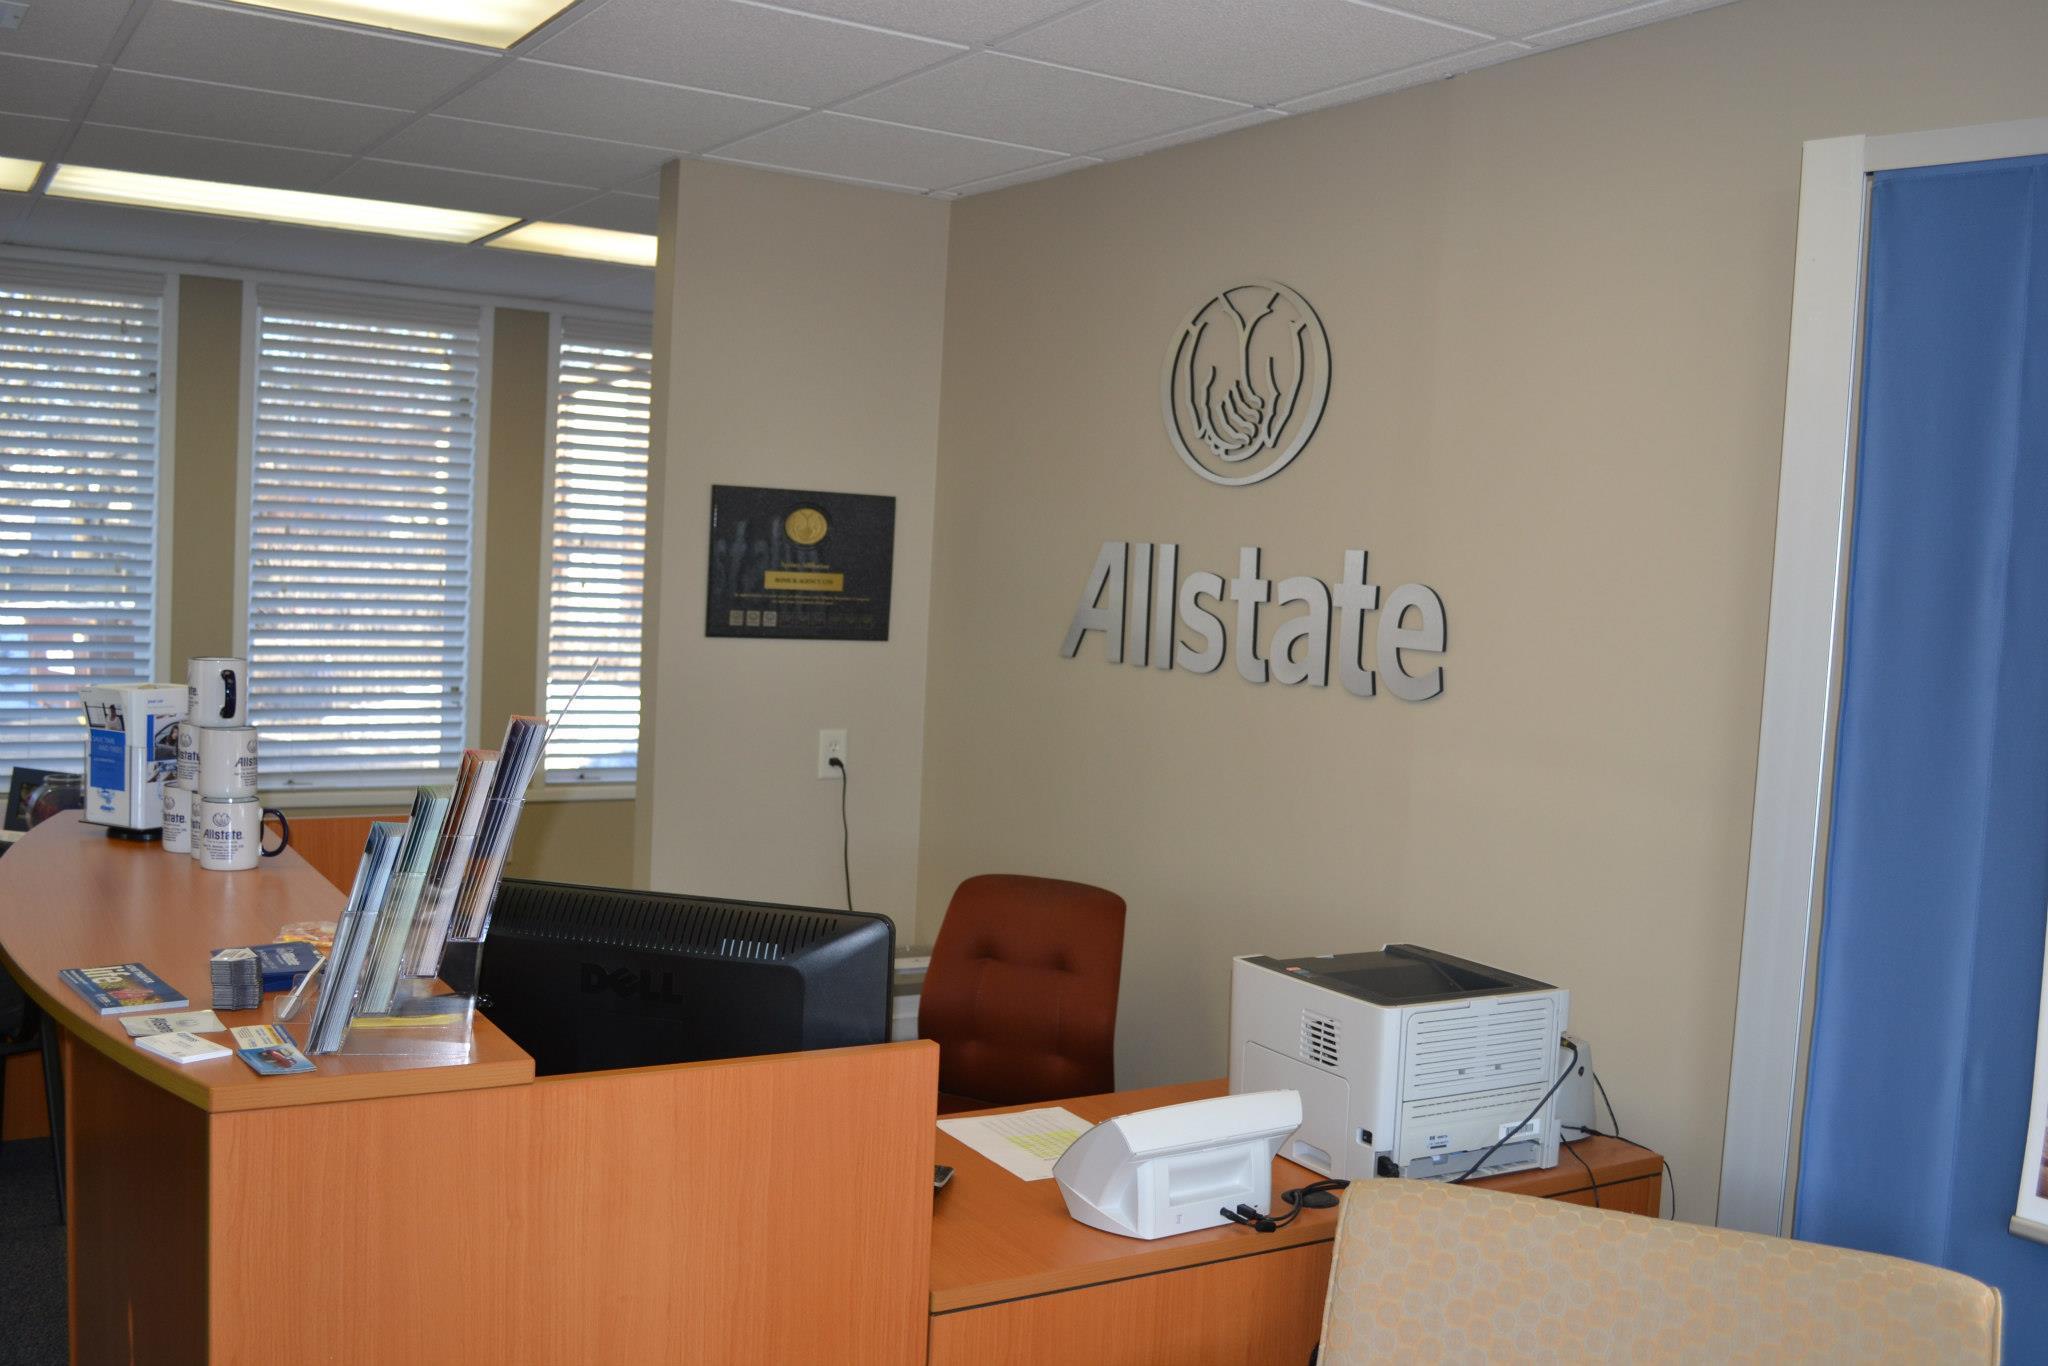 Gary Bonick: Allstate Insurance image 11